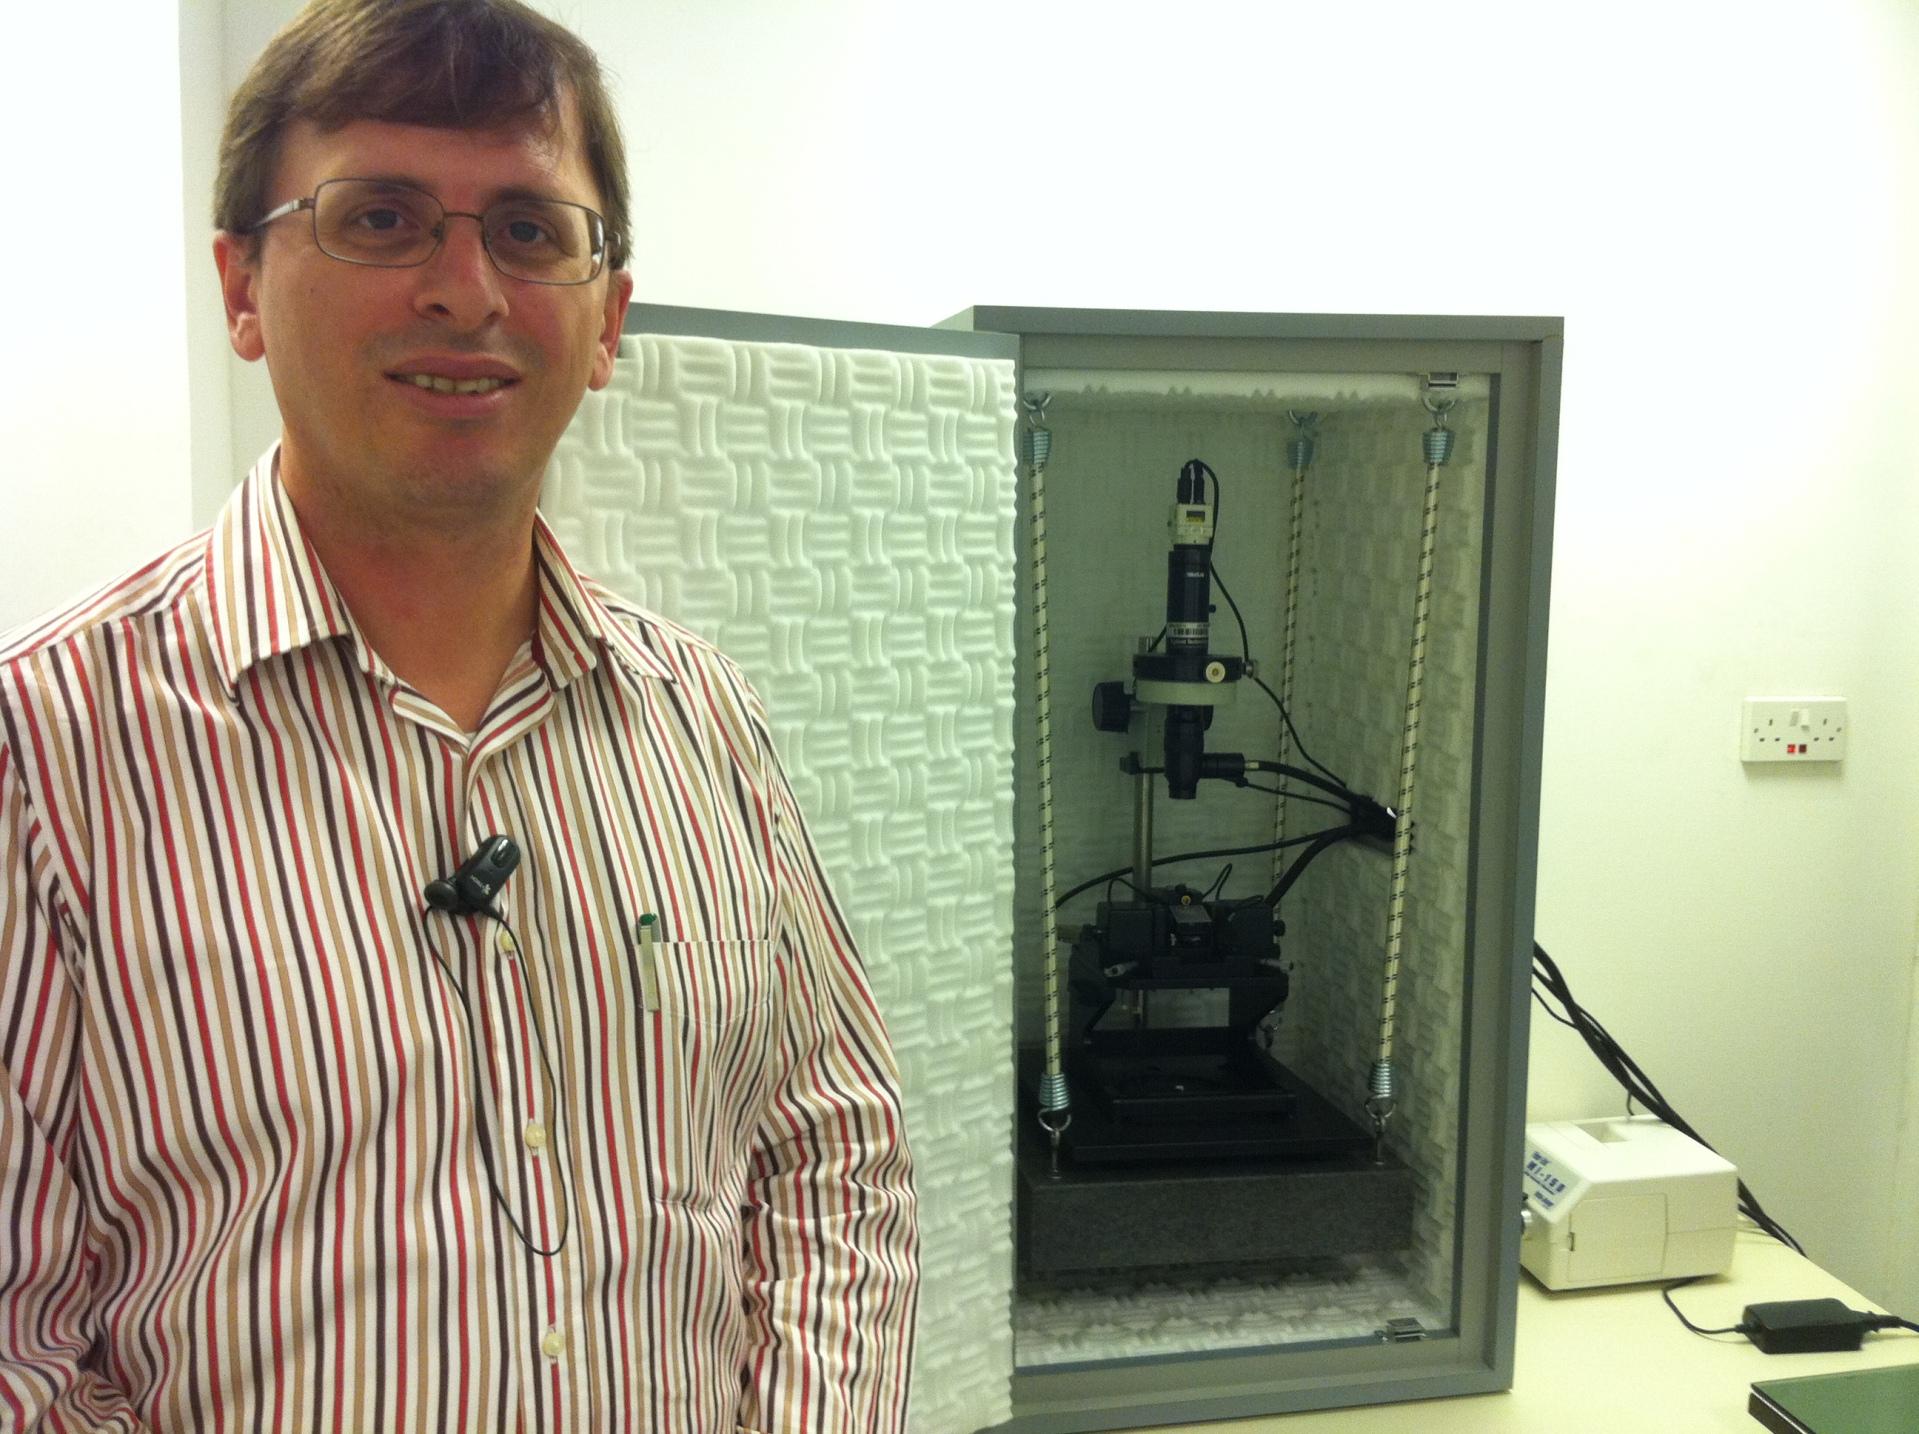 Atomic Force Microscope مجهر القوى الذري